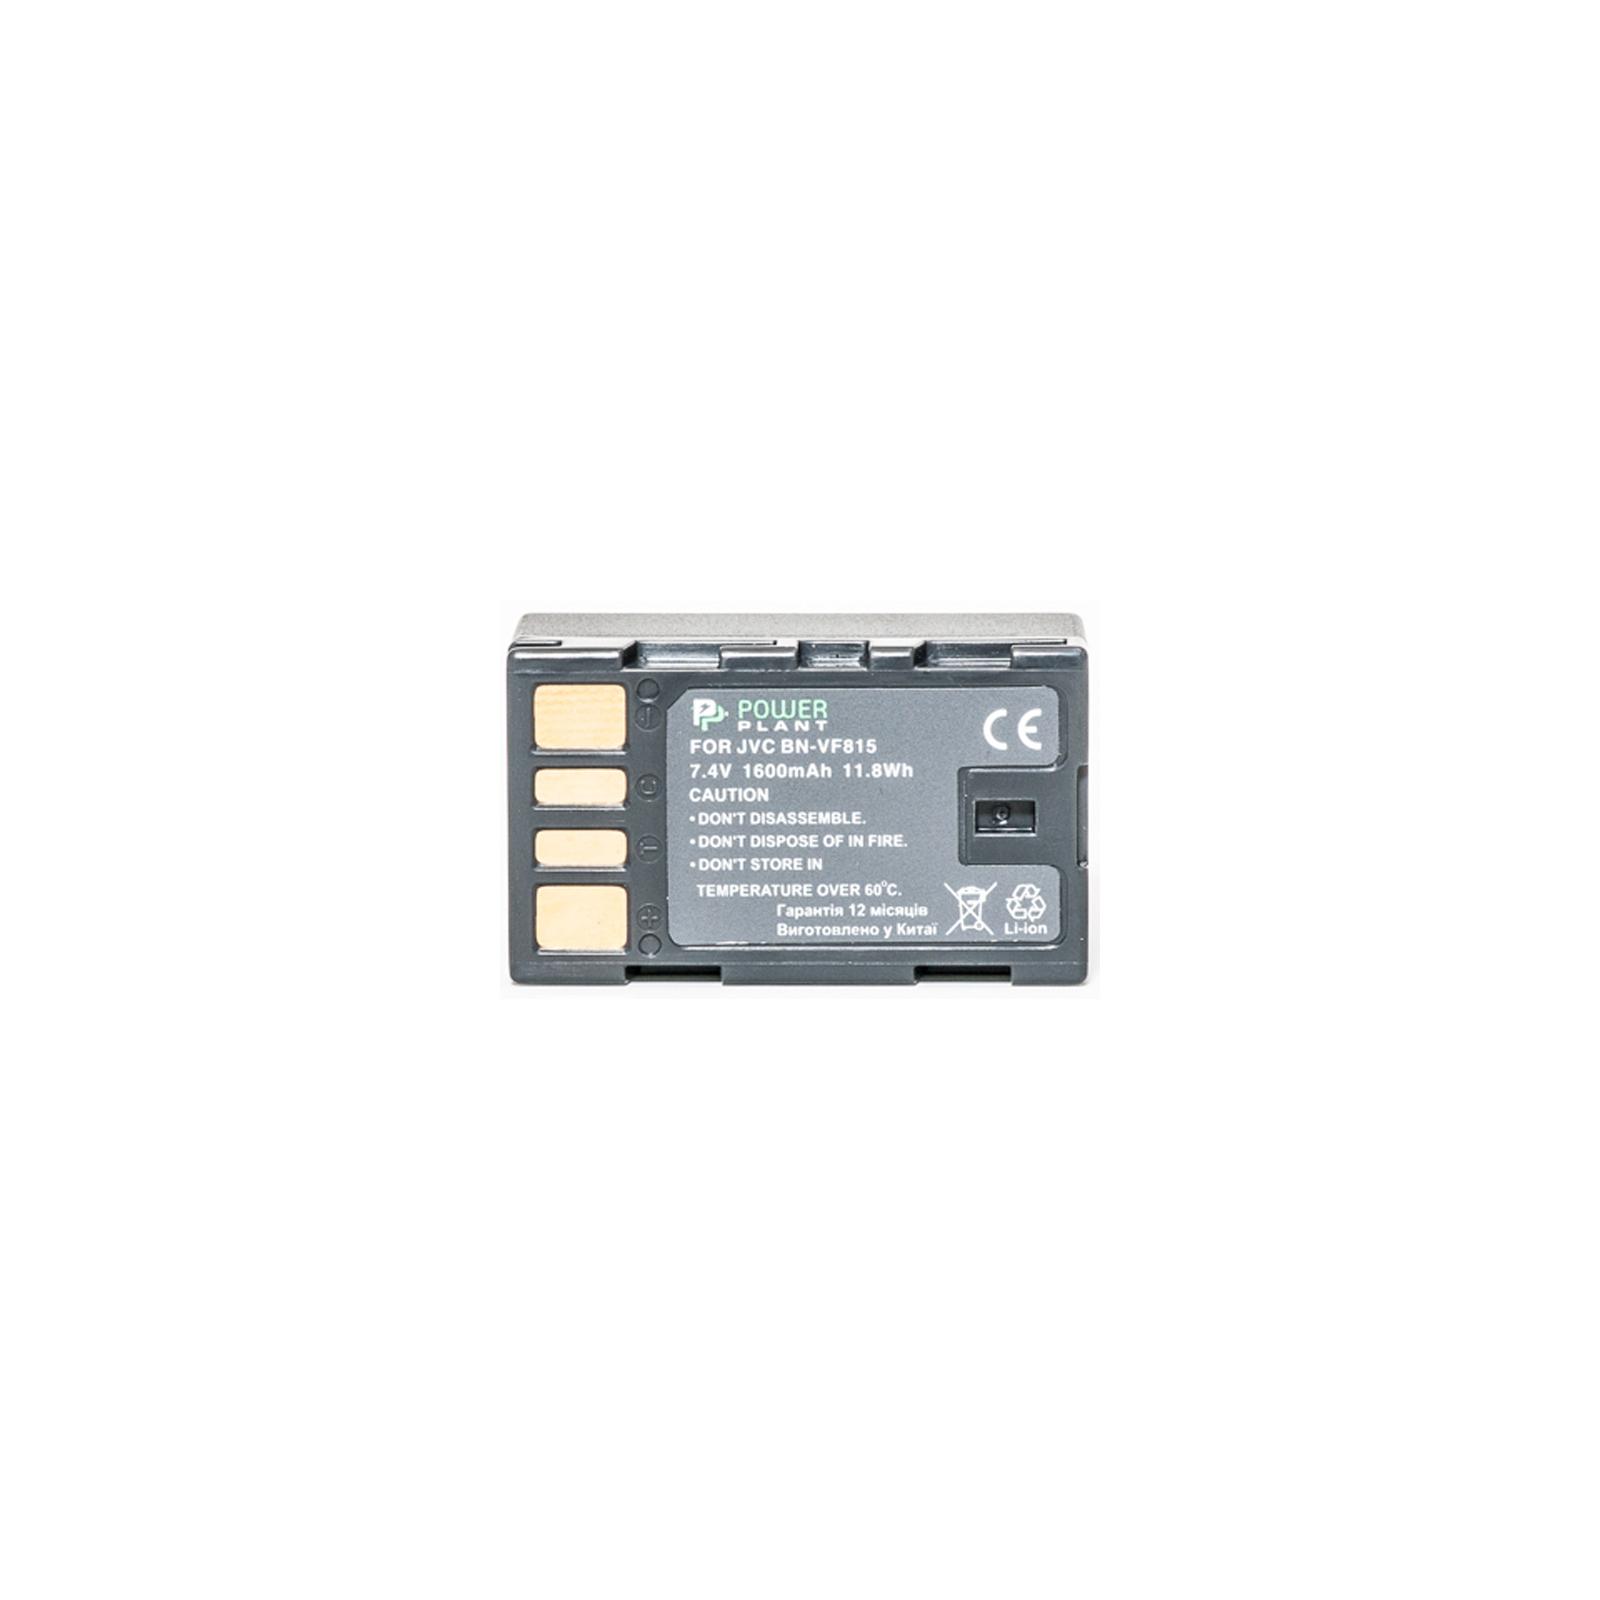 Аккумулятор к фото/видео PowerPlant JVC BN-VF815 (DV00DV1221) изображение 2